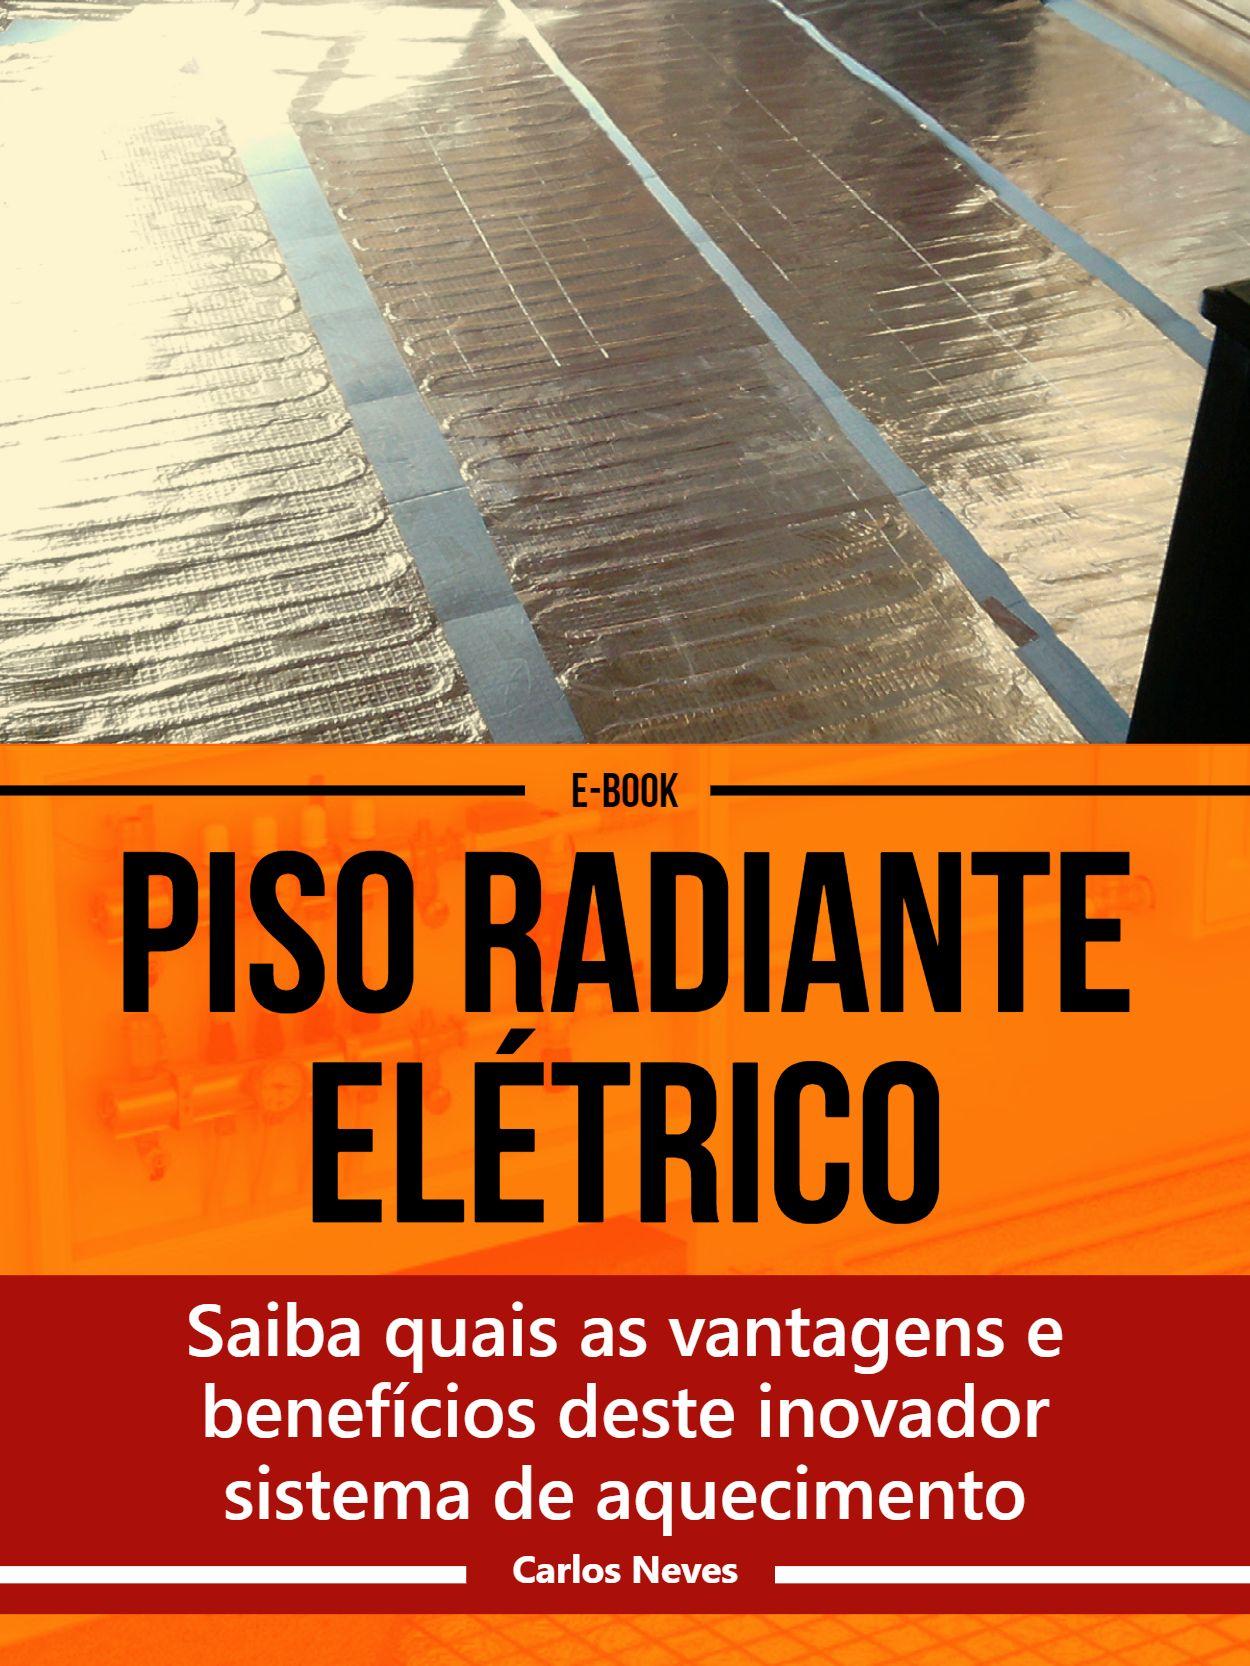 E Book Piso Radiante Elétrico V4 1